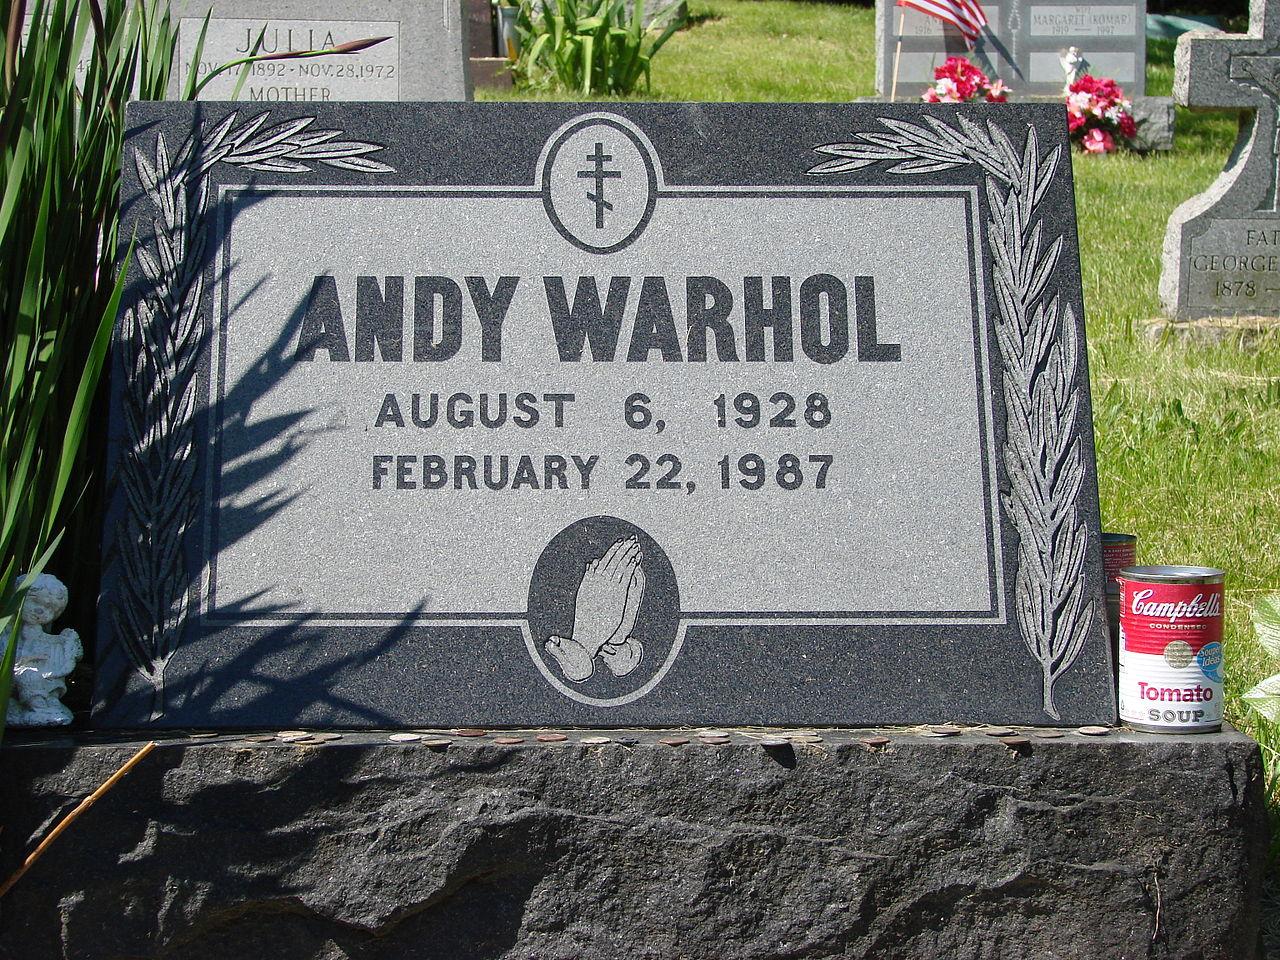 ANDY WARHOL, NAGROBEK